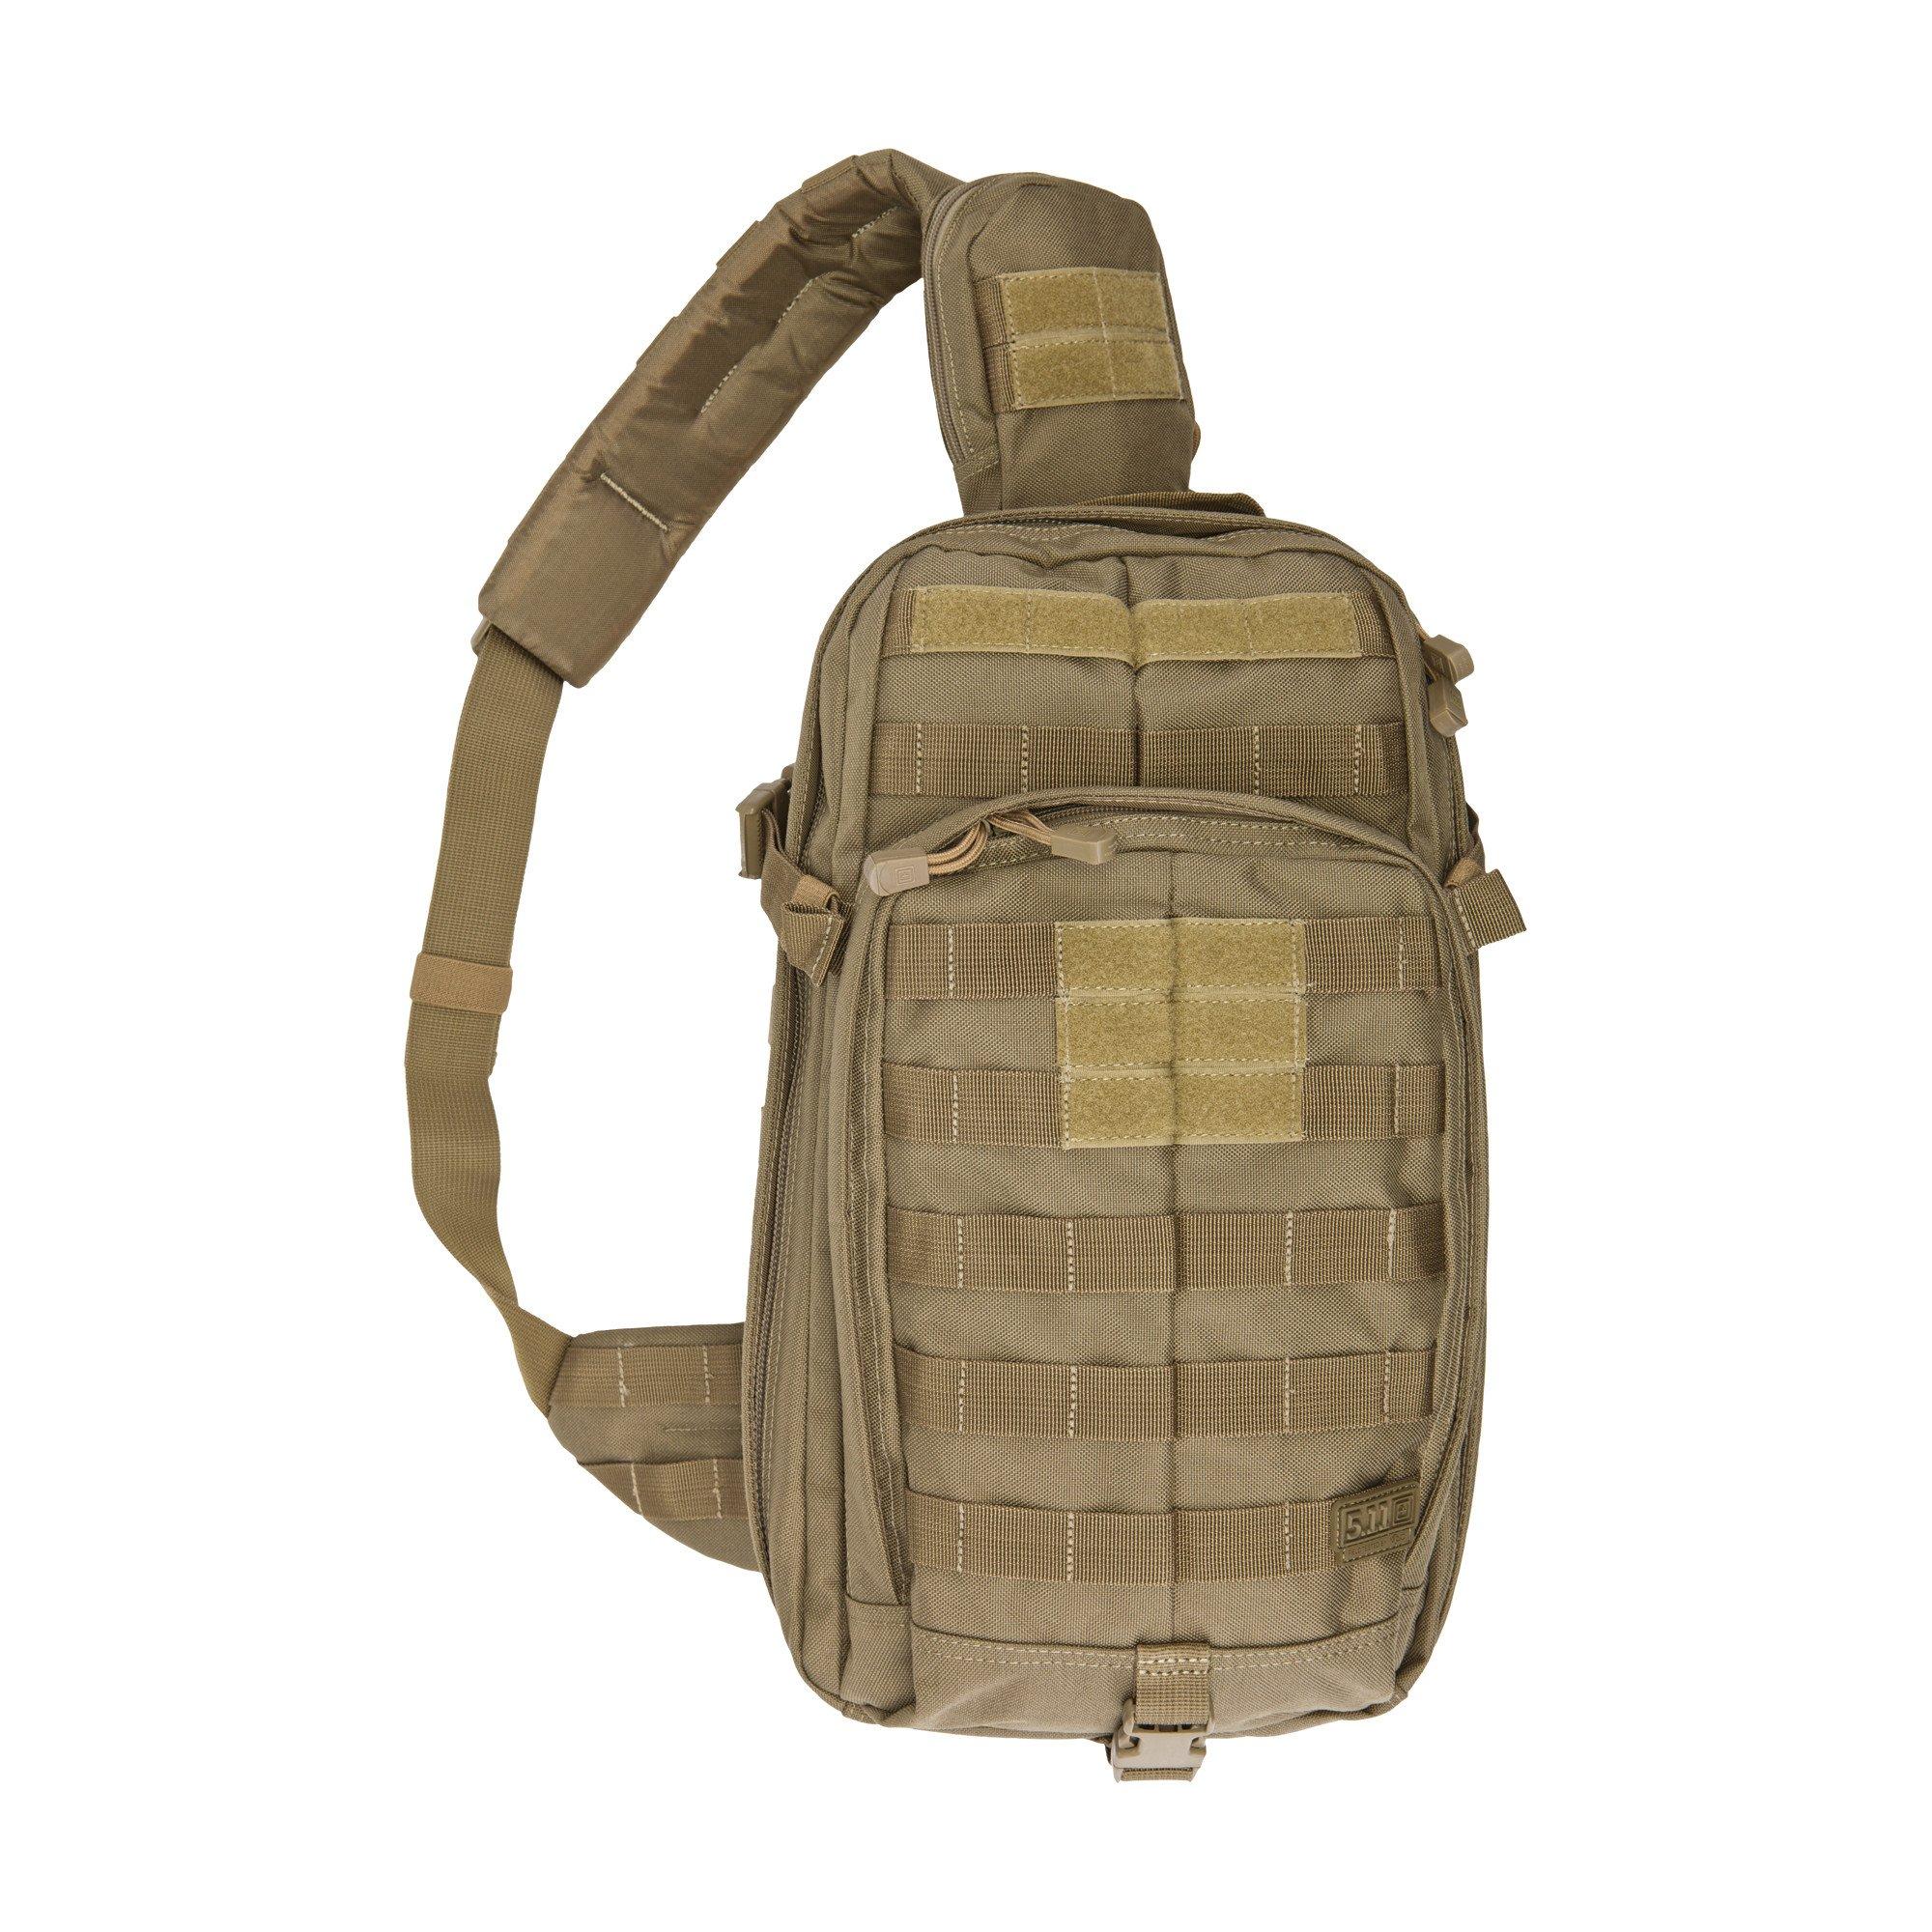 Balo 5.11 Tactical Moab 10 – Sandstone